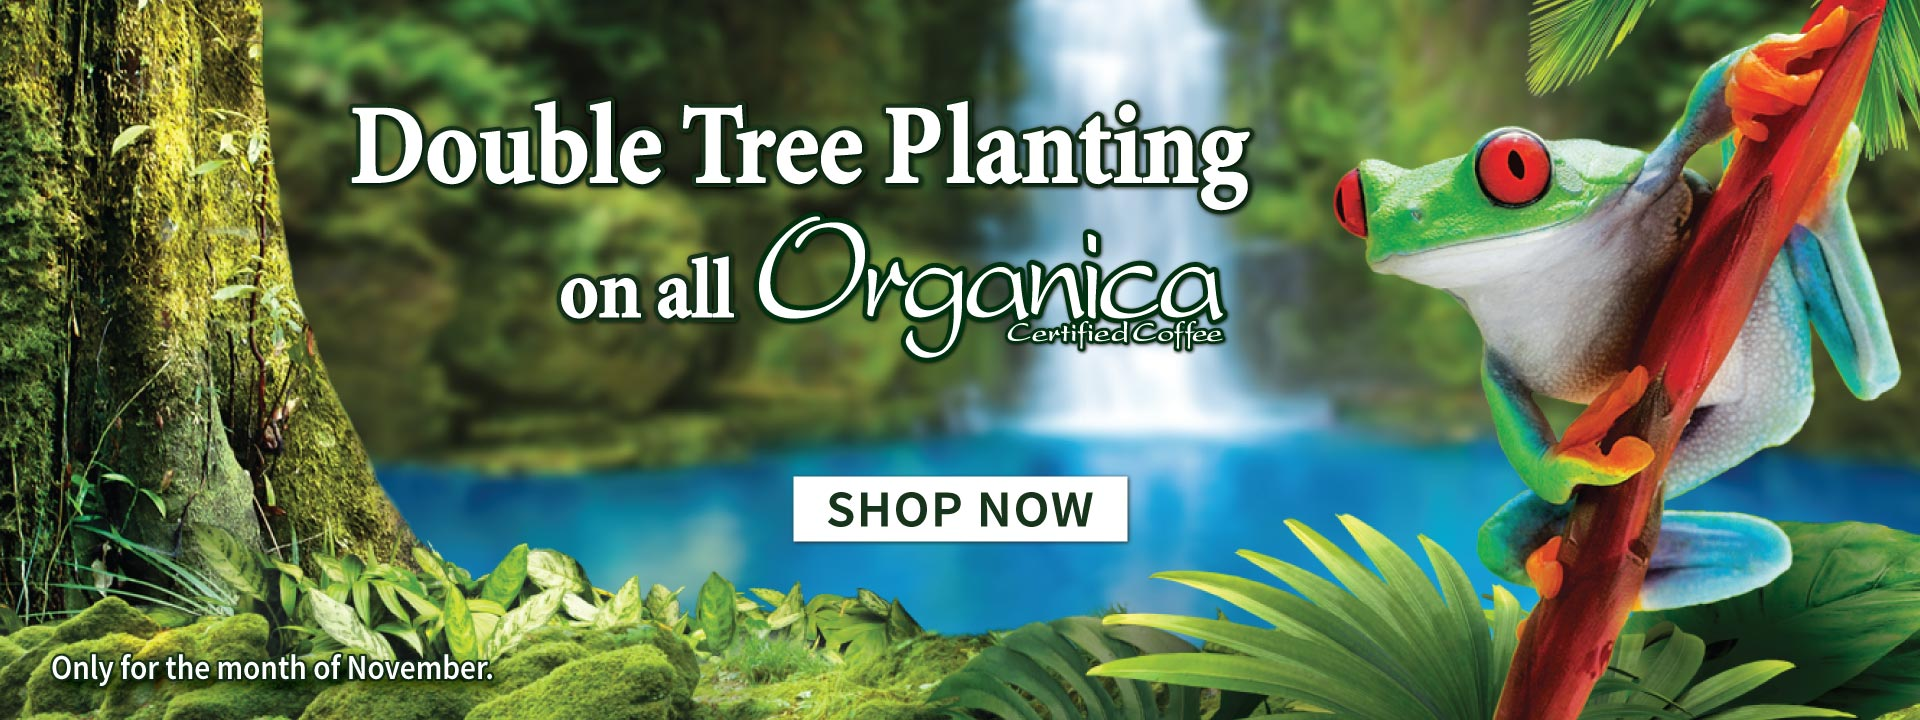 double tree planting